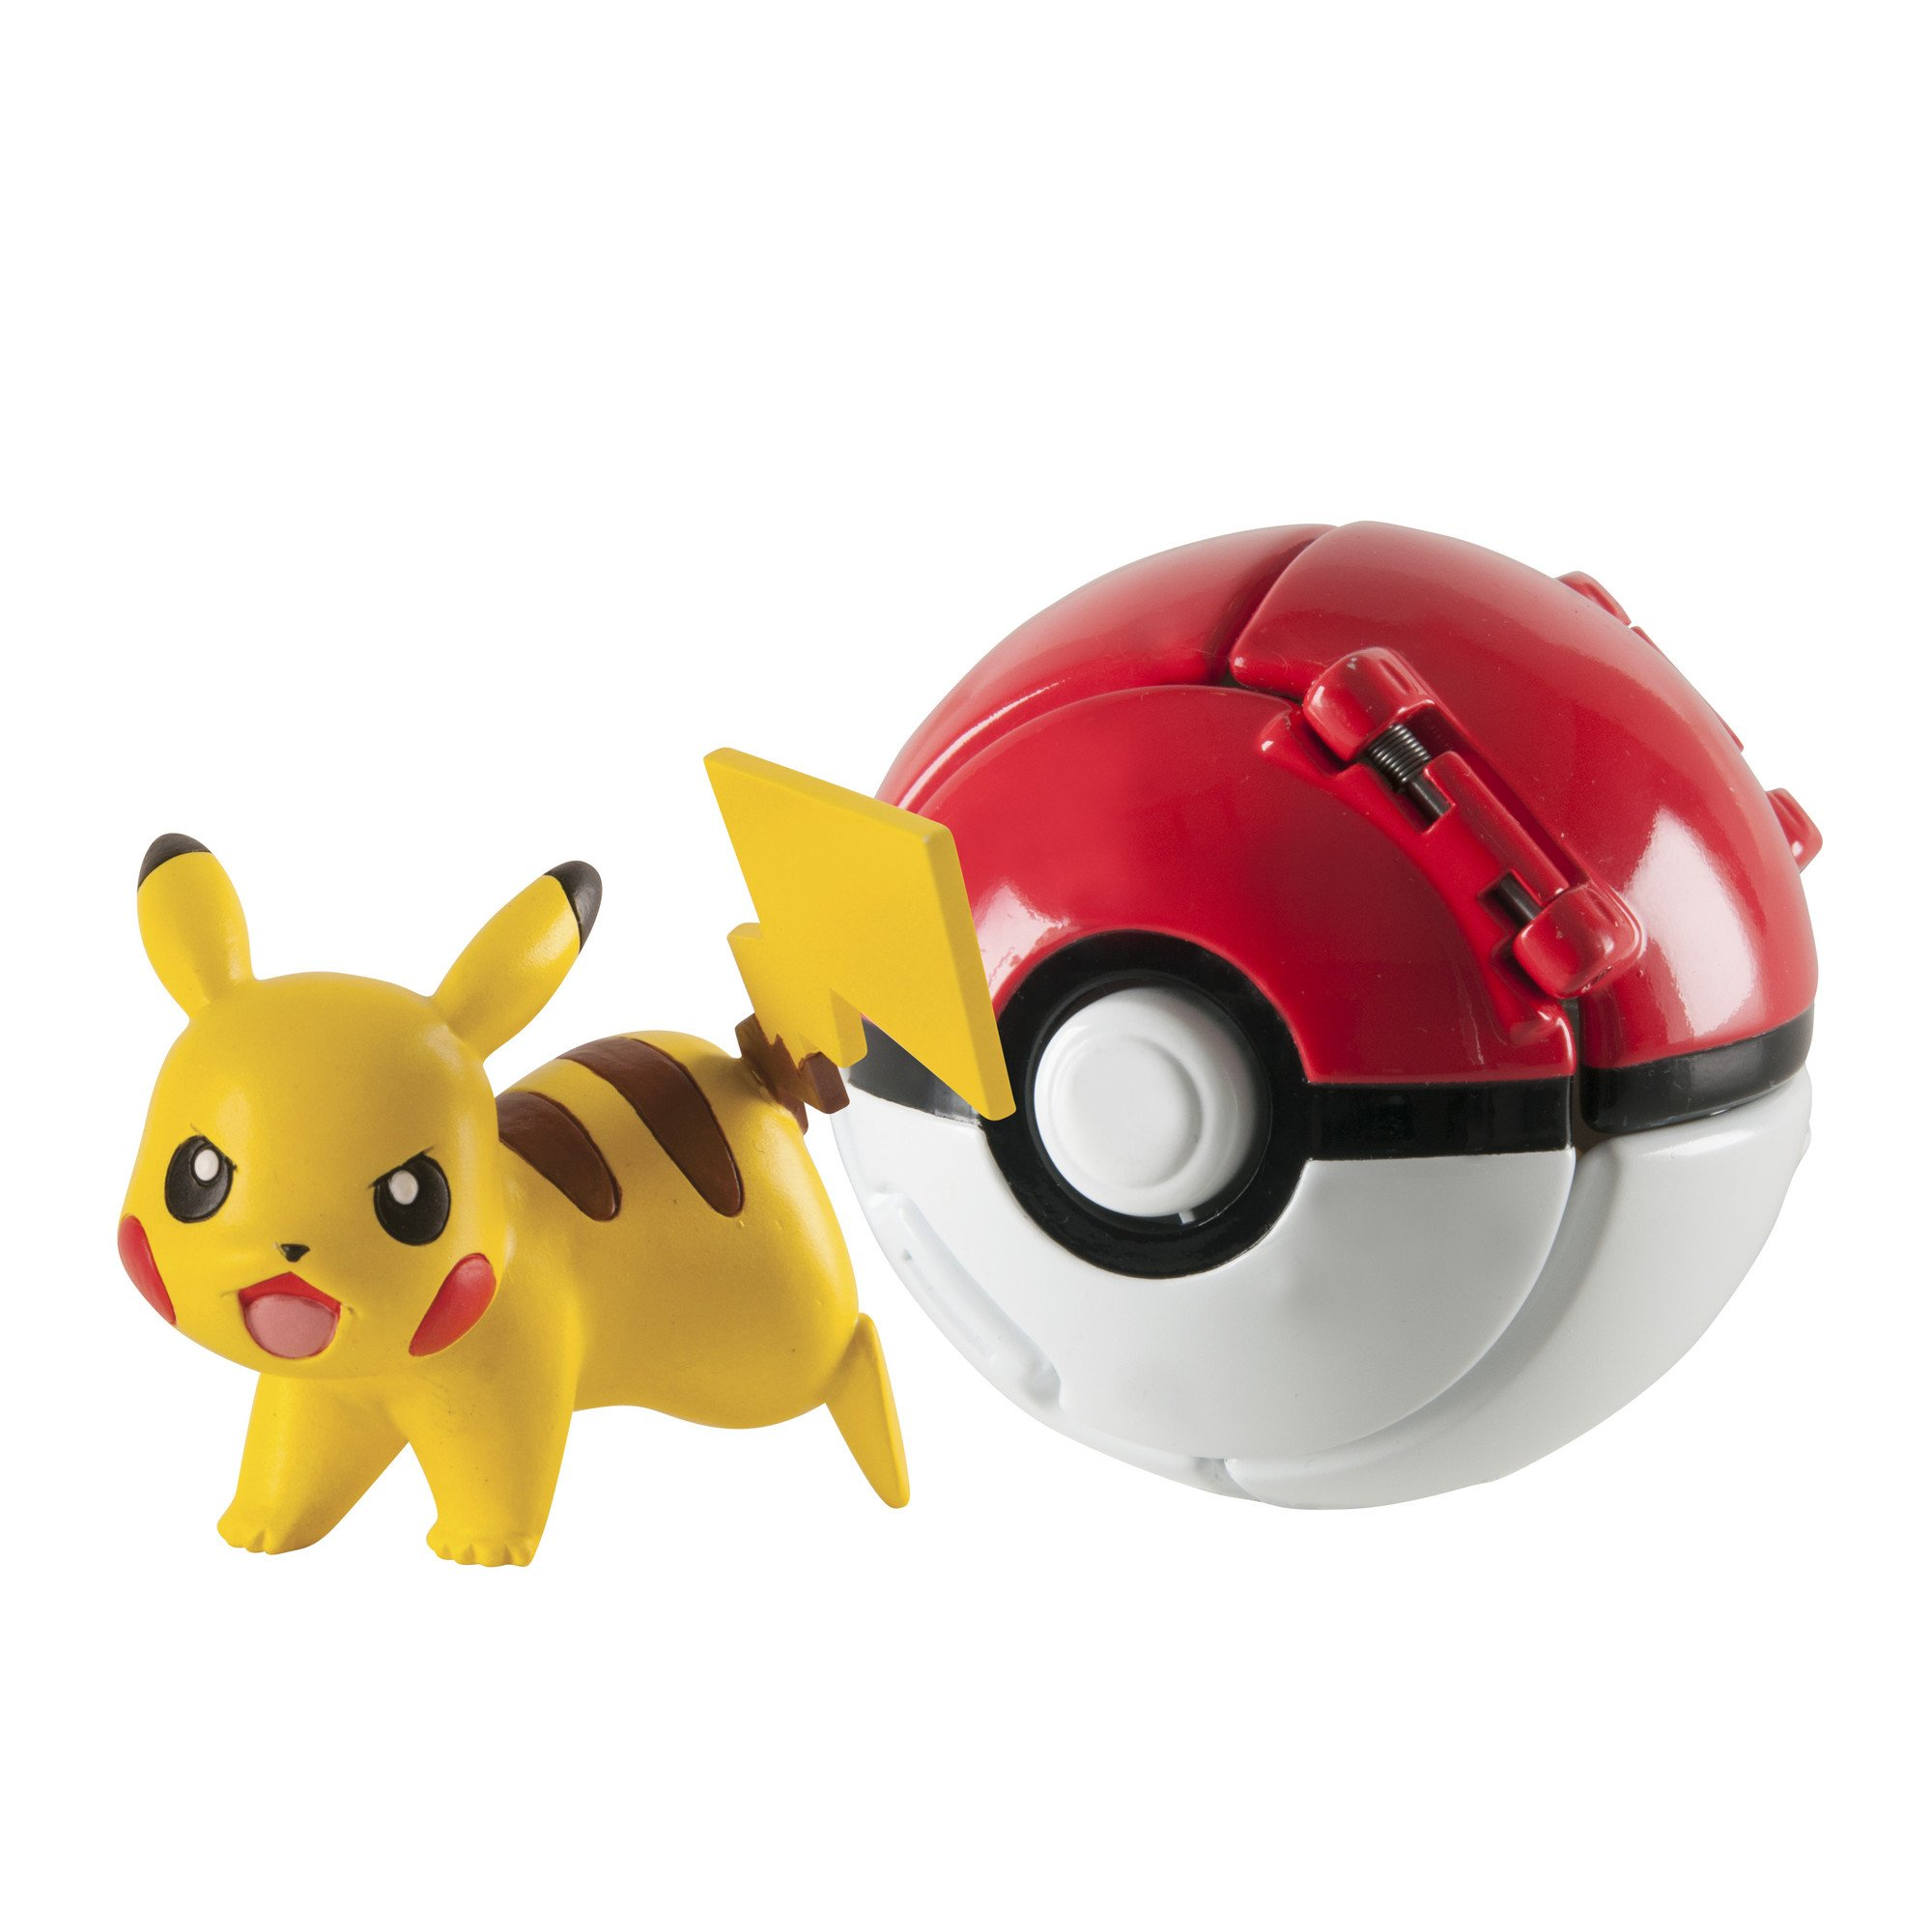 Throw 'N' Pop Pikachu and Poké Ball